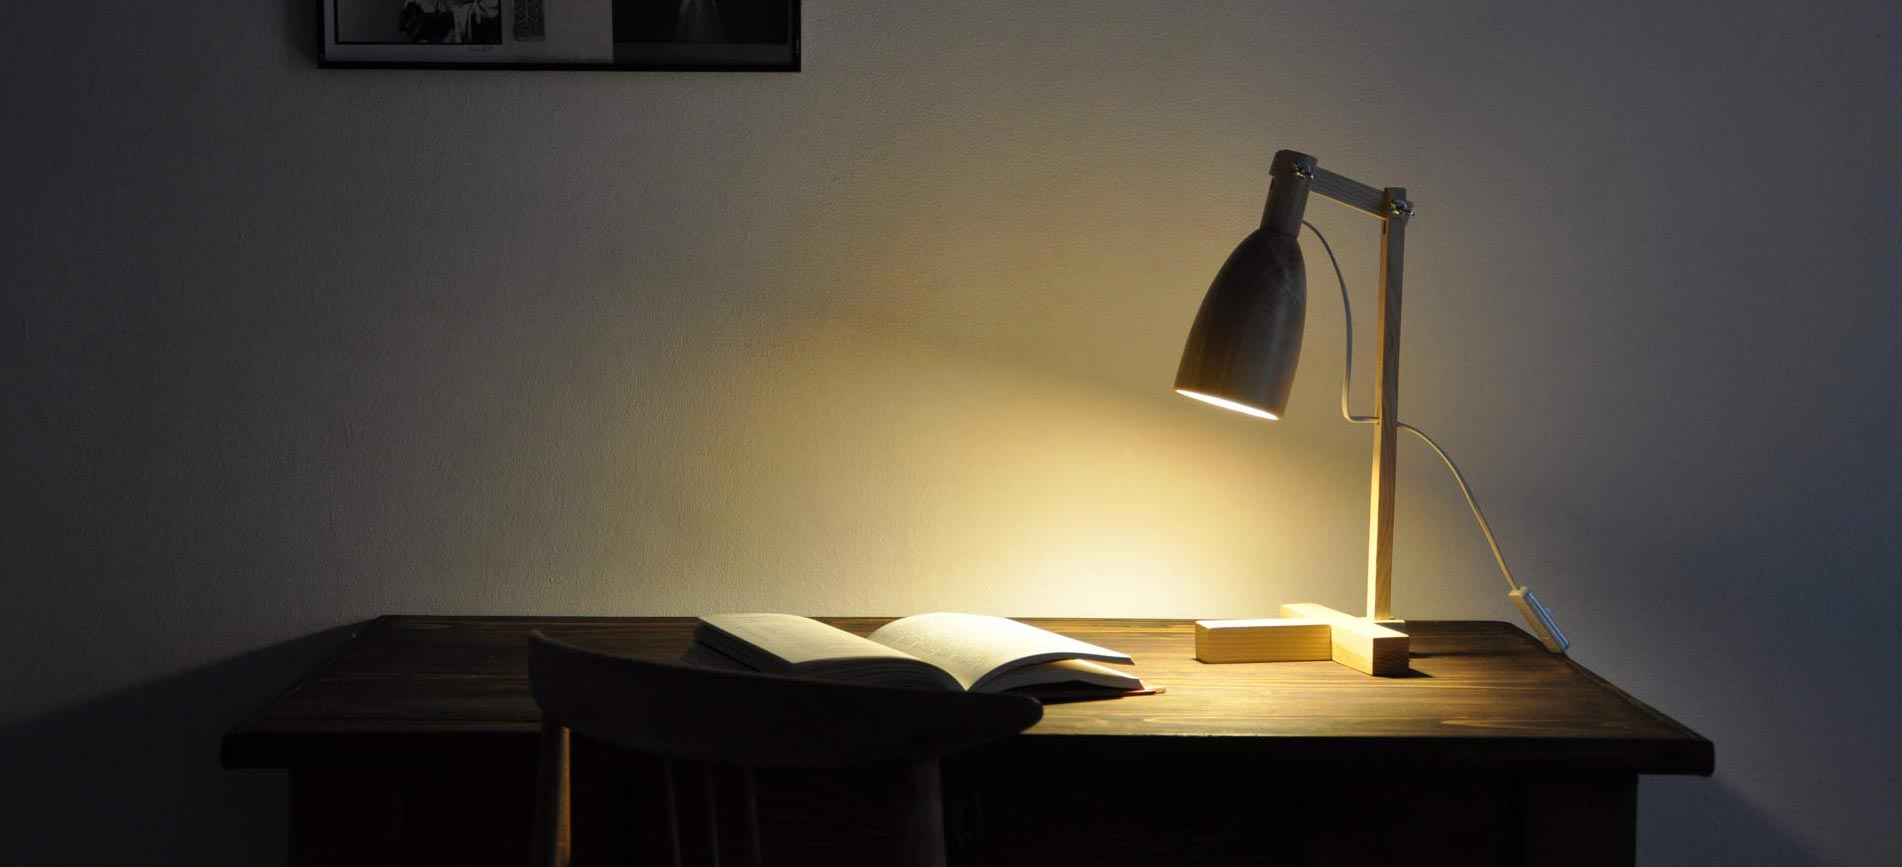 Fingerprint desk lamp - crea-re.com - eco design by Crea-Re Studio based for Desk Lamp Photography  75tgx